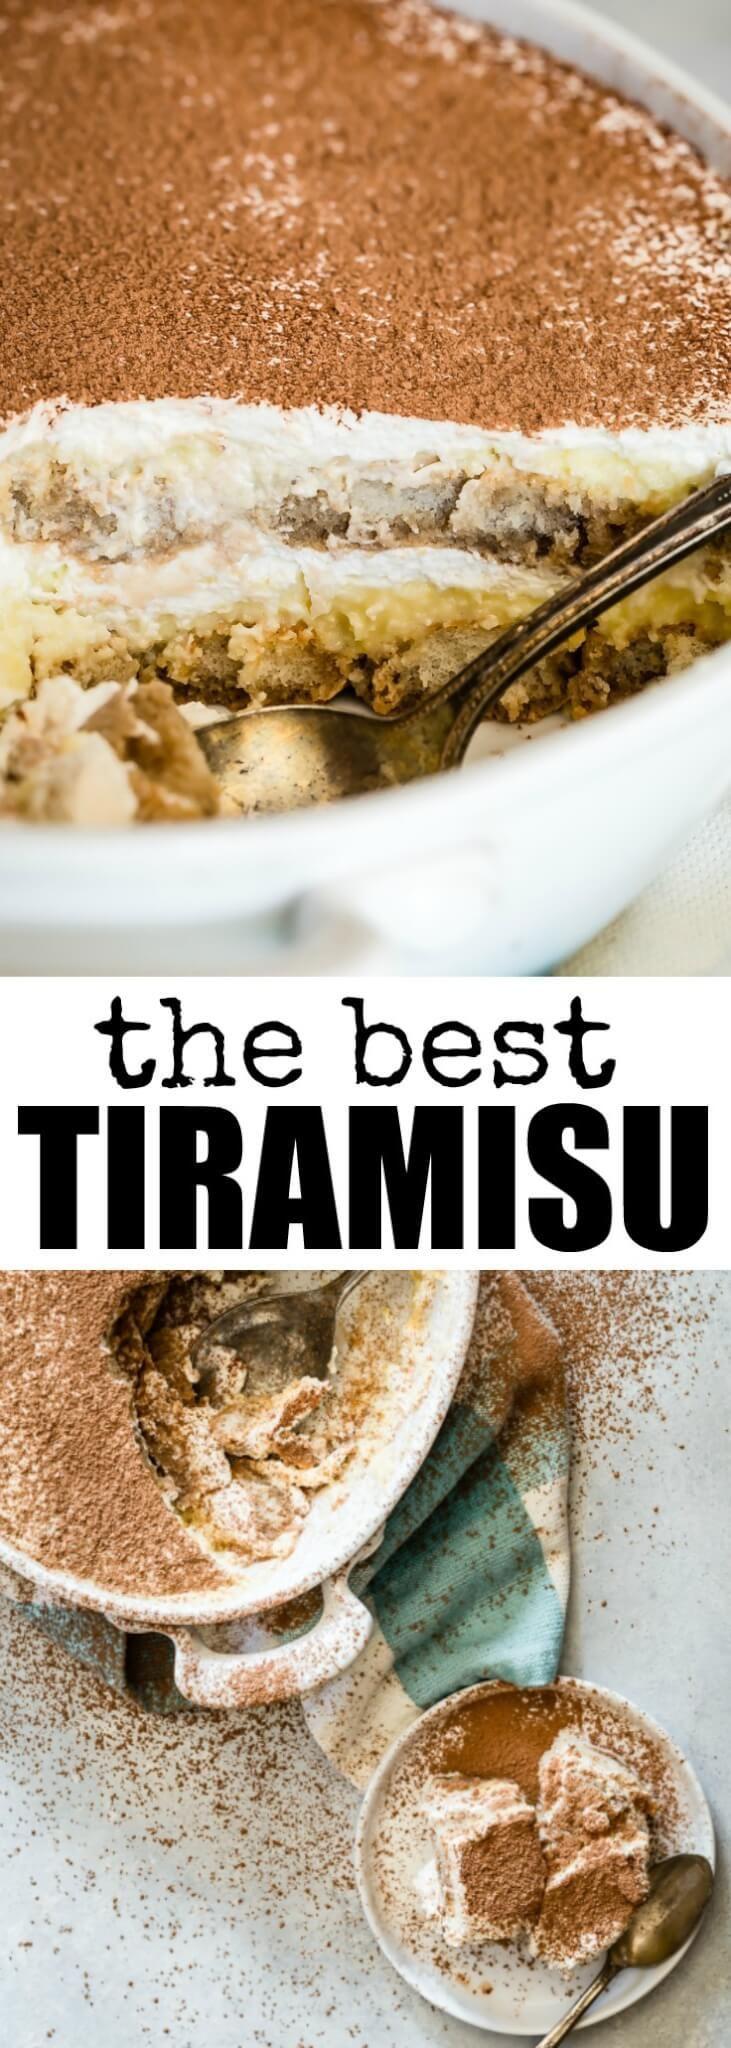 Recreate the classic Italian dessert at home with… #tiramisu #italiandessert #dessert #culinaryhill